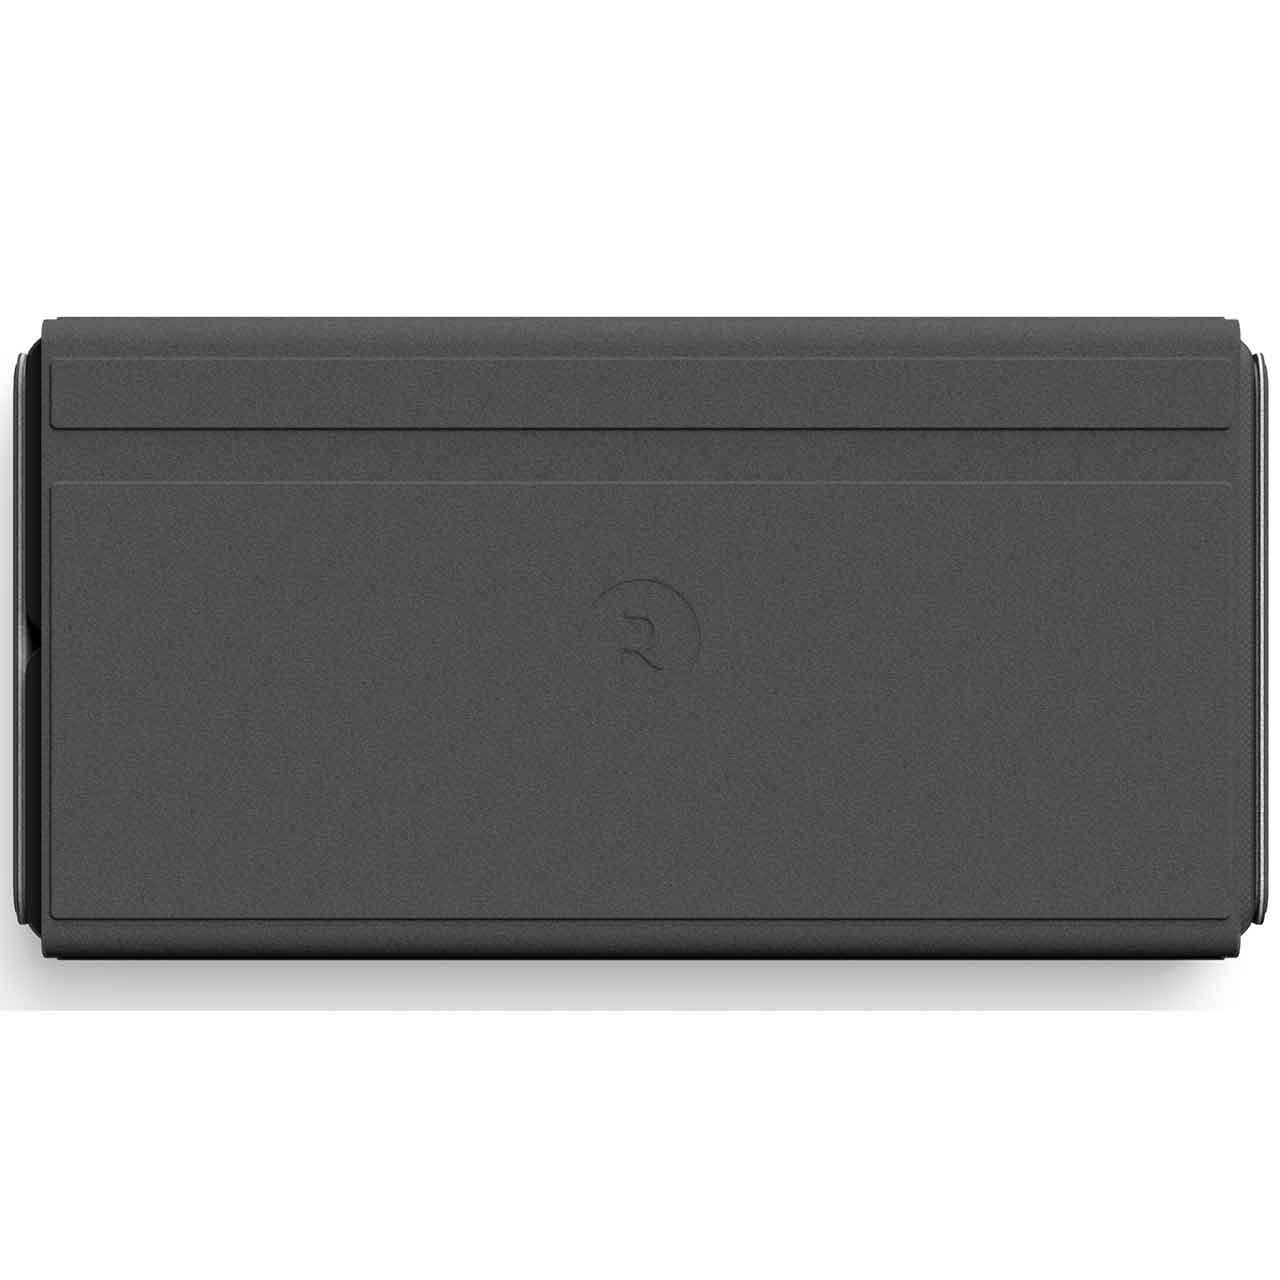 کاور لایت پد کنترلر رولی مدل Snapcase Duo